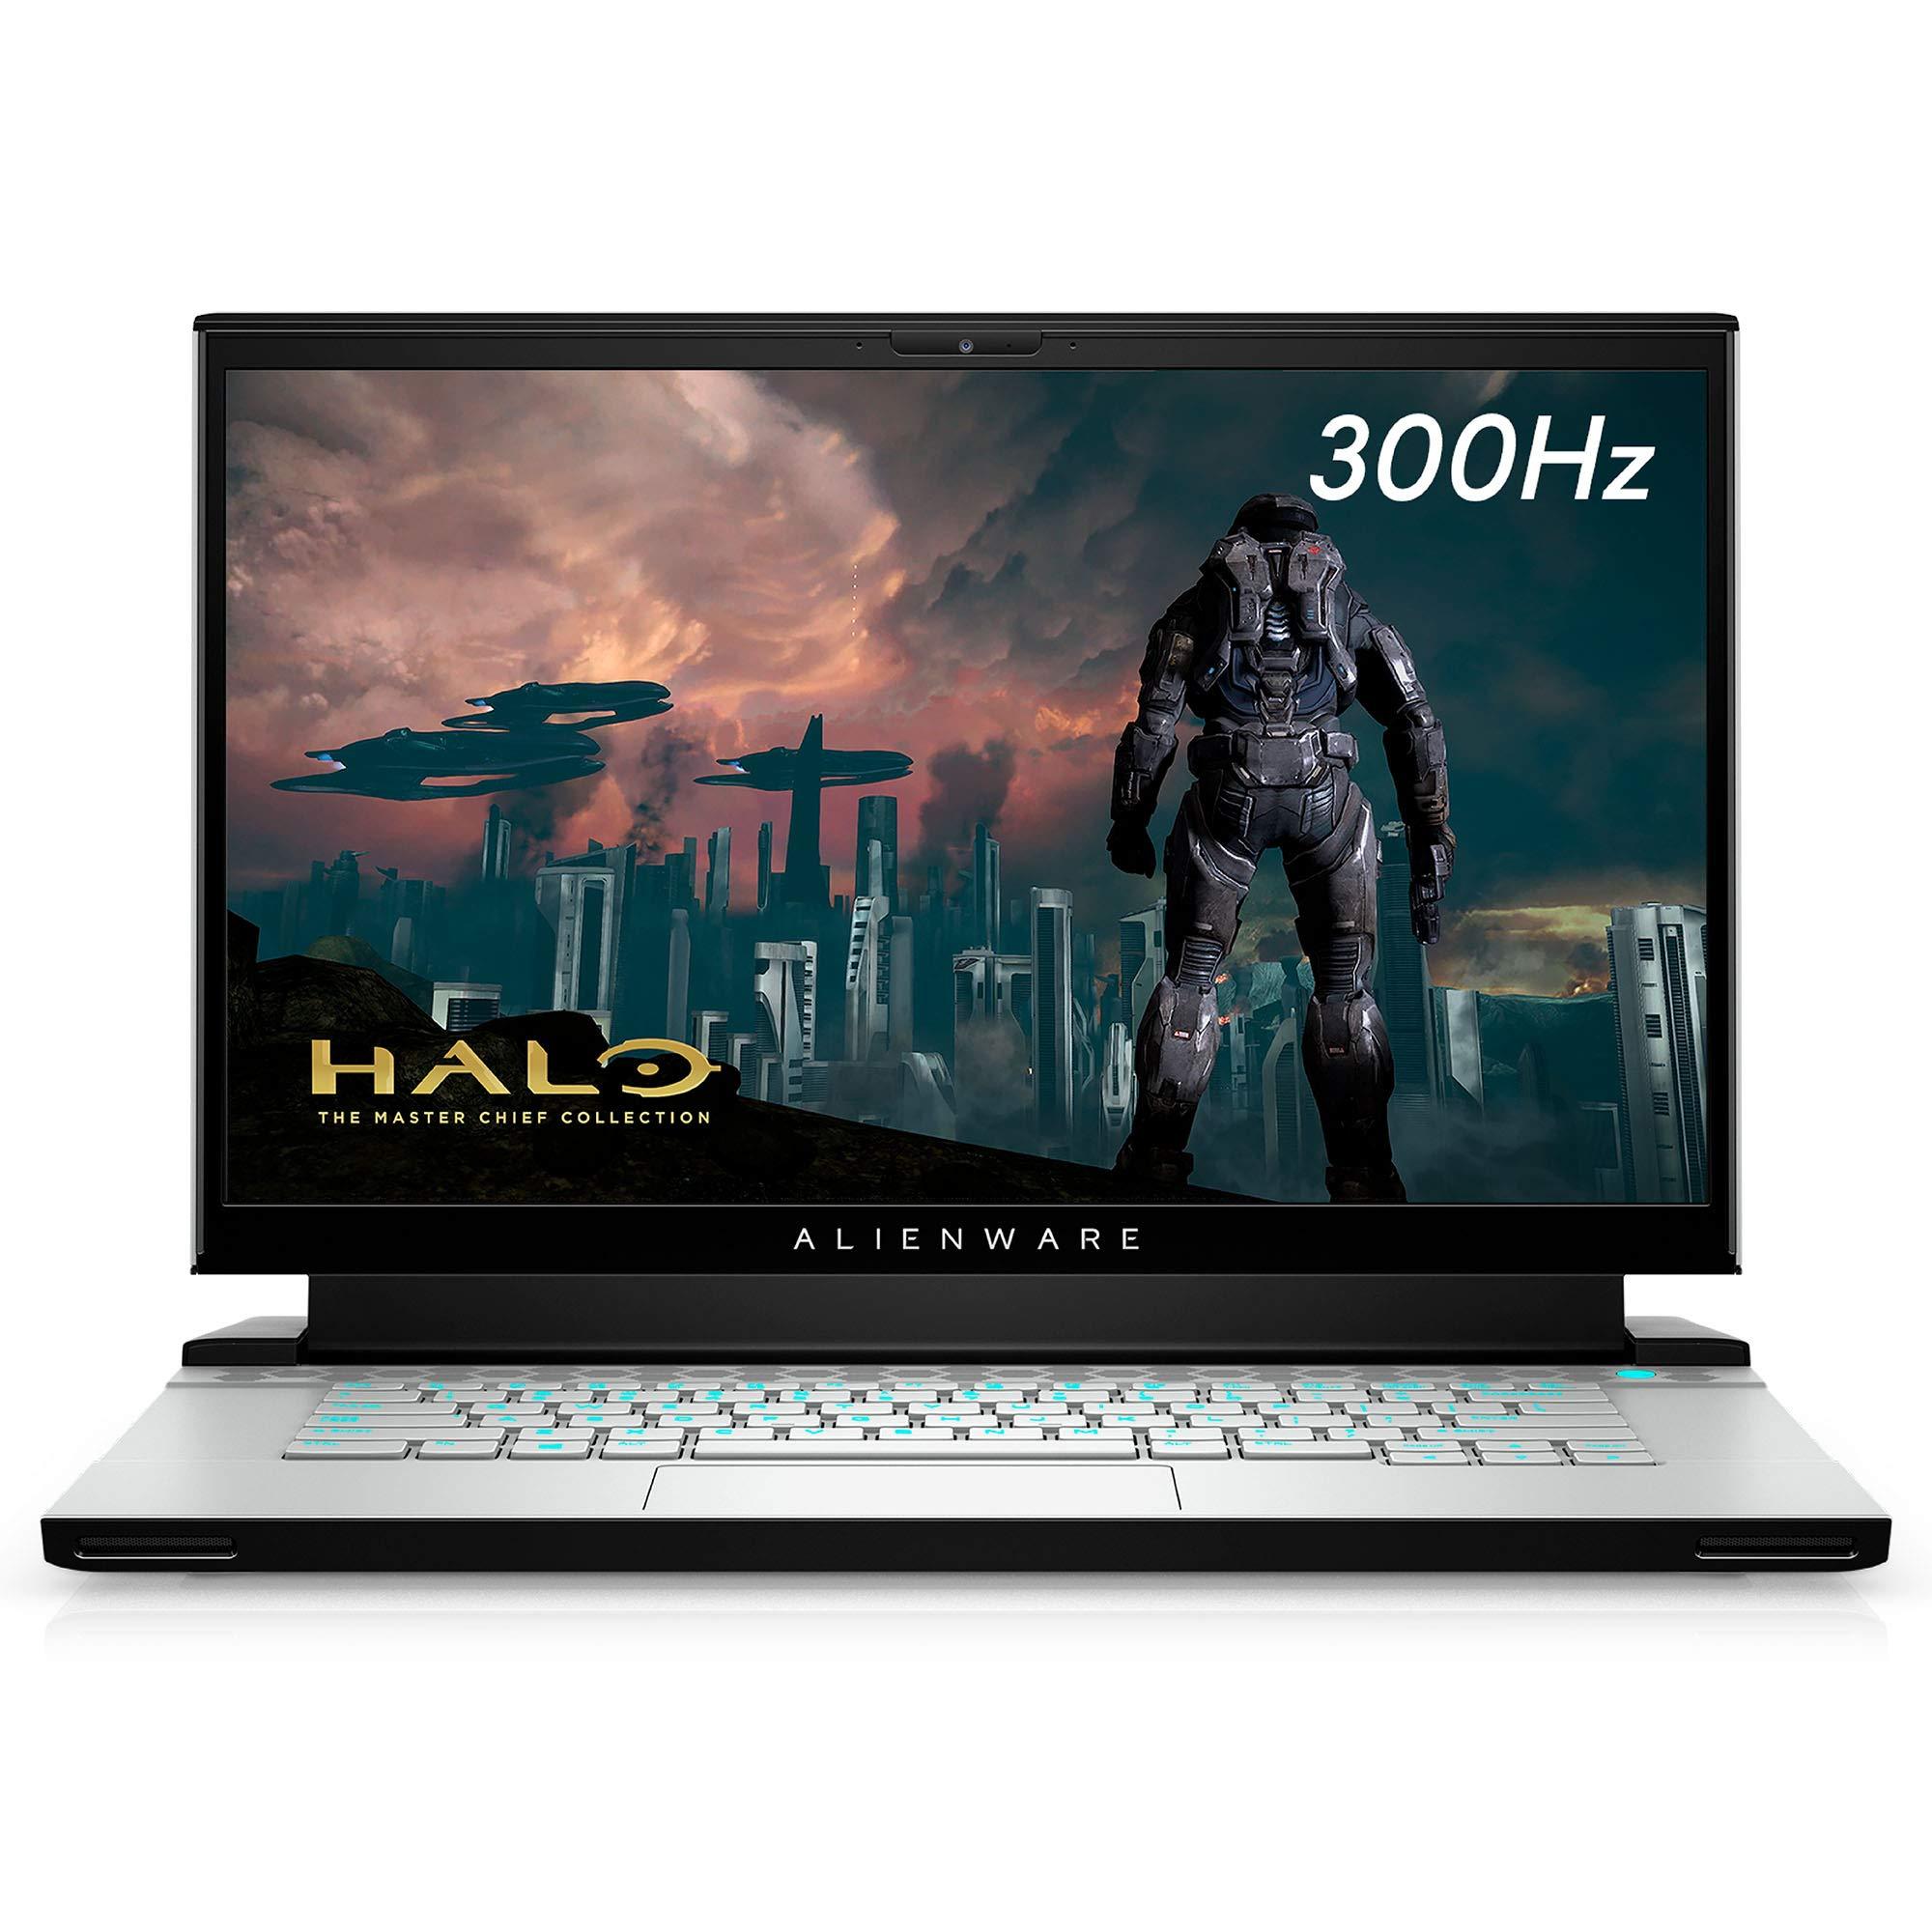 Nueva computadora portátil para juegos Alienware m15 FHD de 15.6 pulgadas (Lunar Light) Intel Core i7-10750H 10th Gen, 16GB DDR4 RAM, 1TB SSD, Nvidia Geforce RTX 2070 Super 8GB GDDR6, Windows 10 Home (AWm15-7418WHT-PUS)